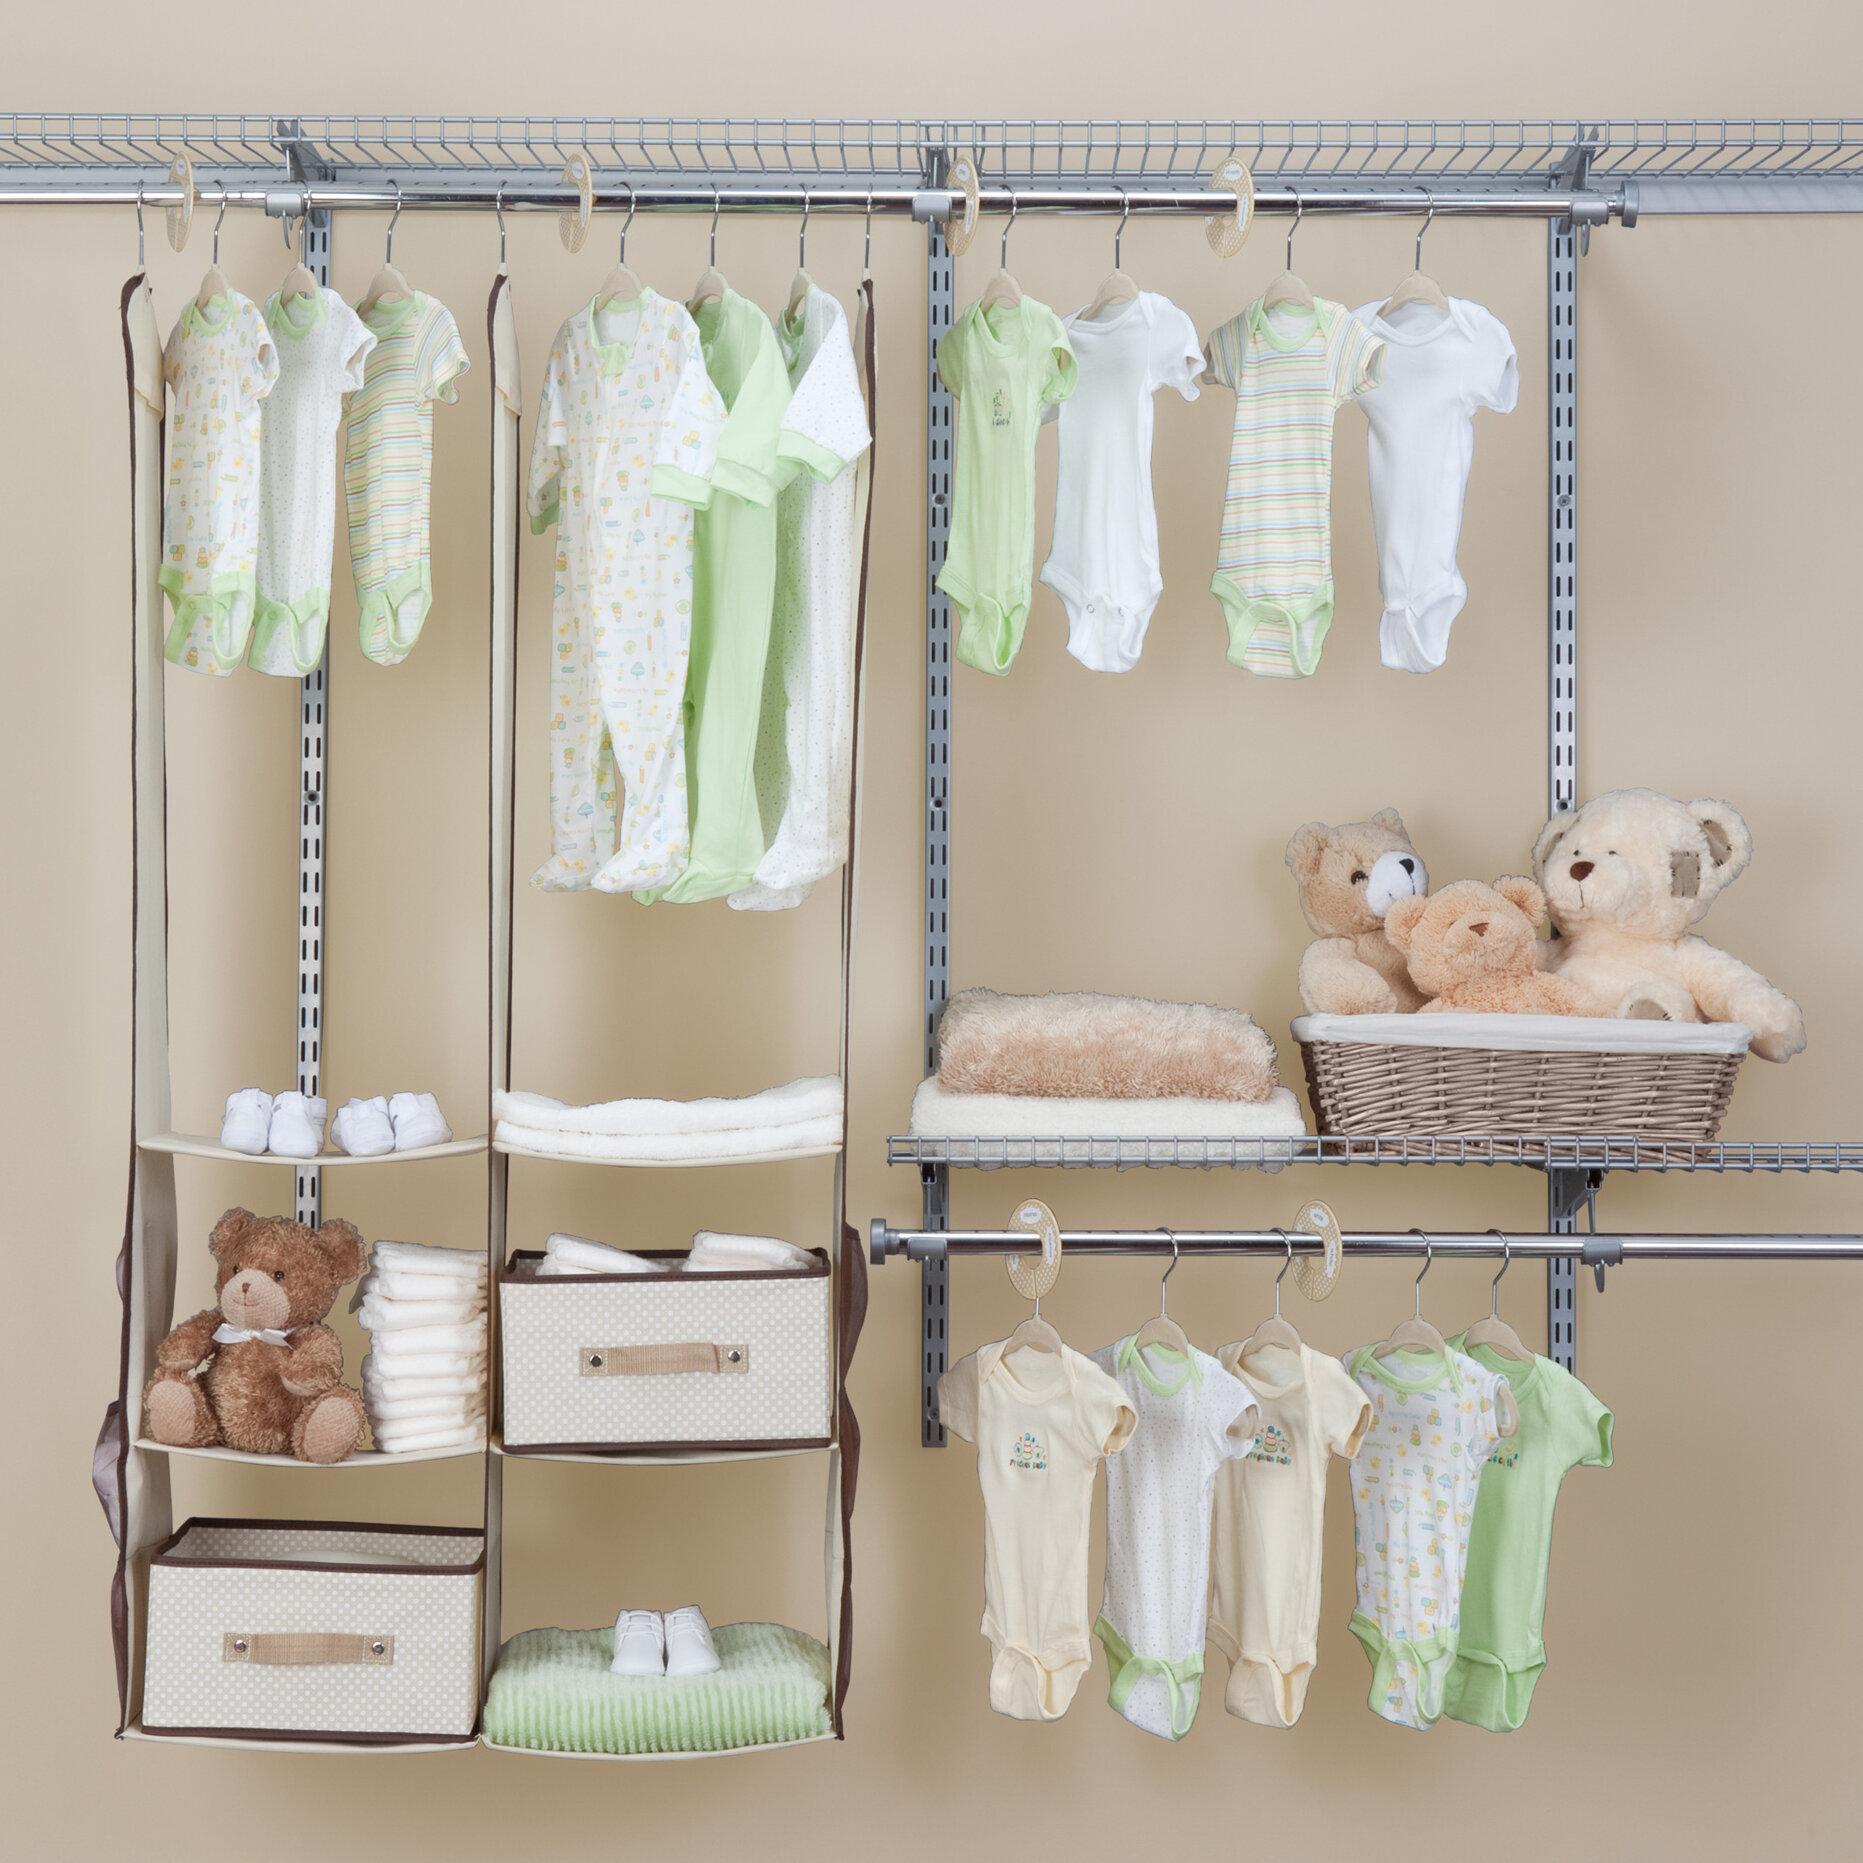 Nursery Closet Organizer 24 Piece Set